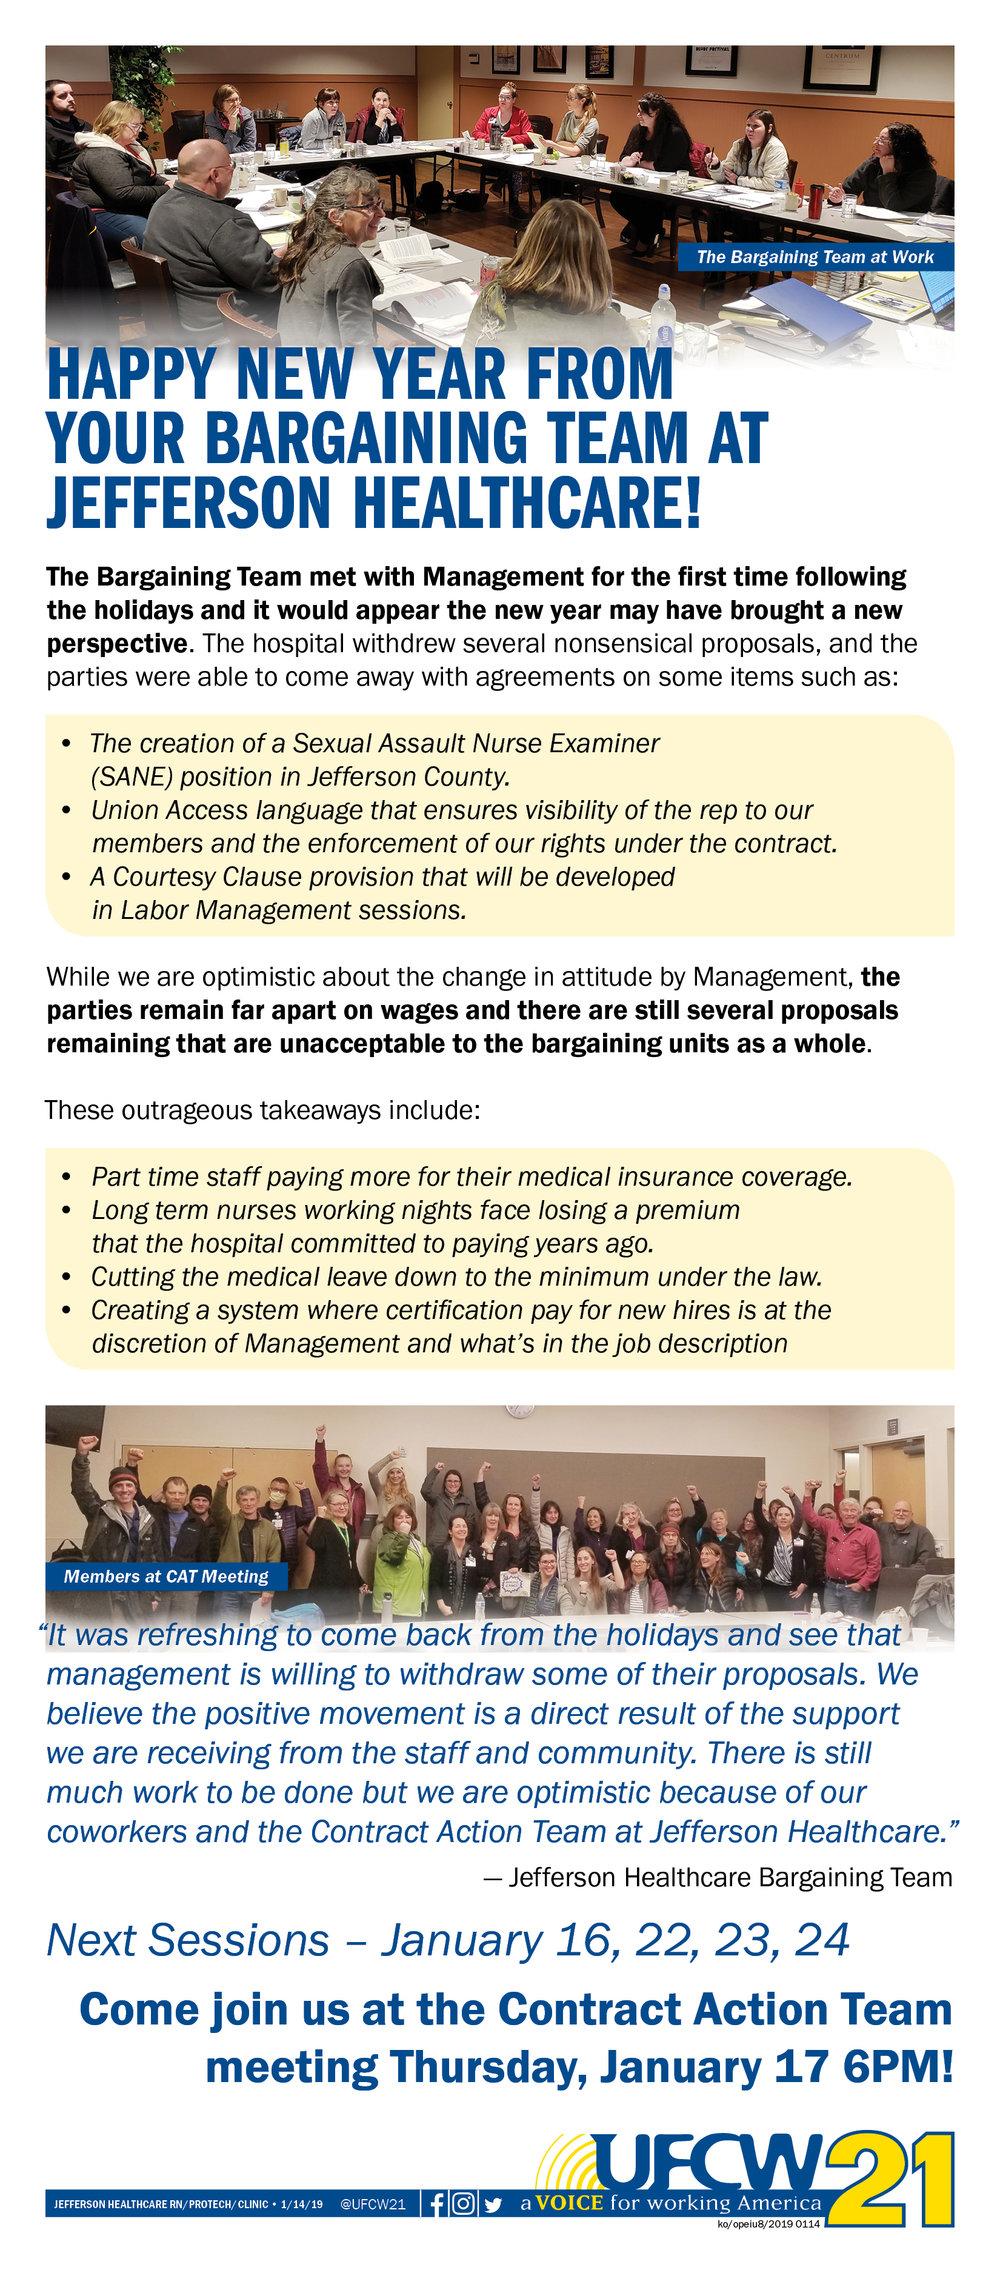 2019 0114 - Jefferson Healthcare.jpg